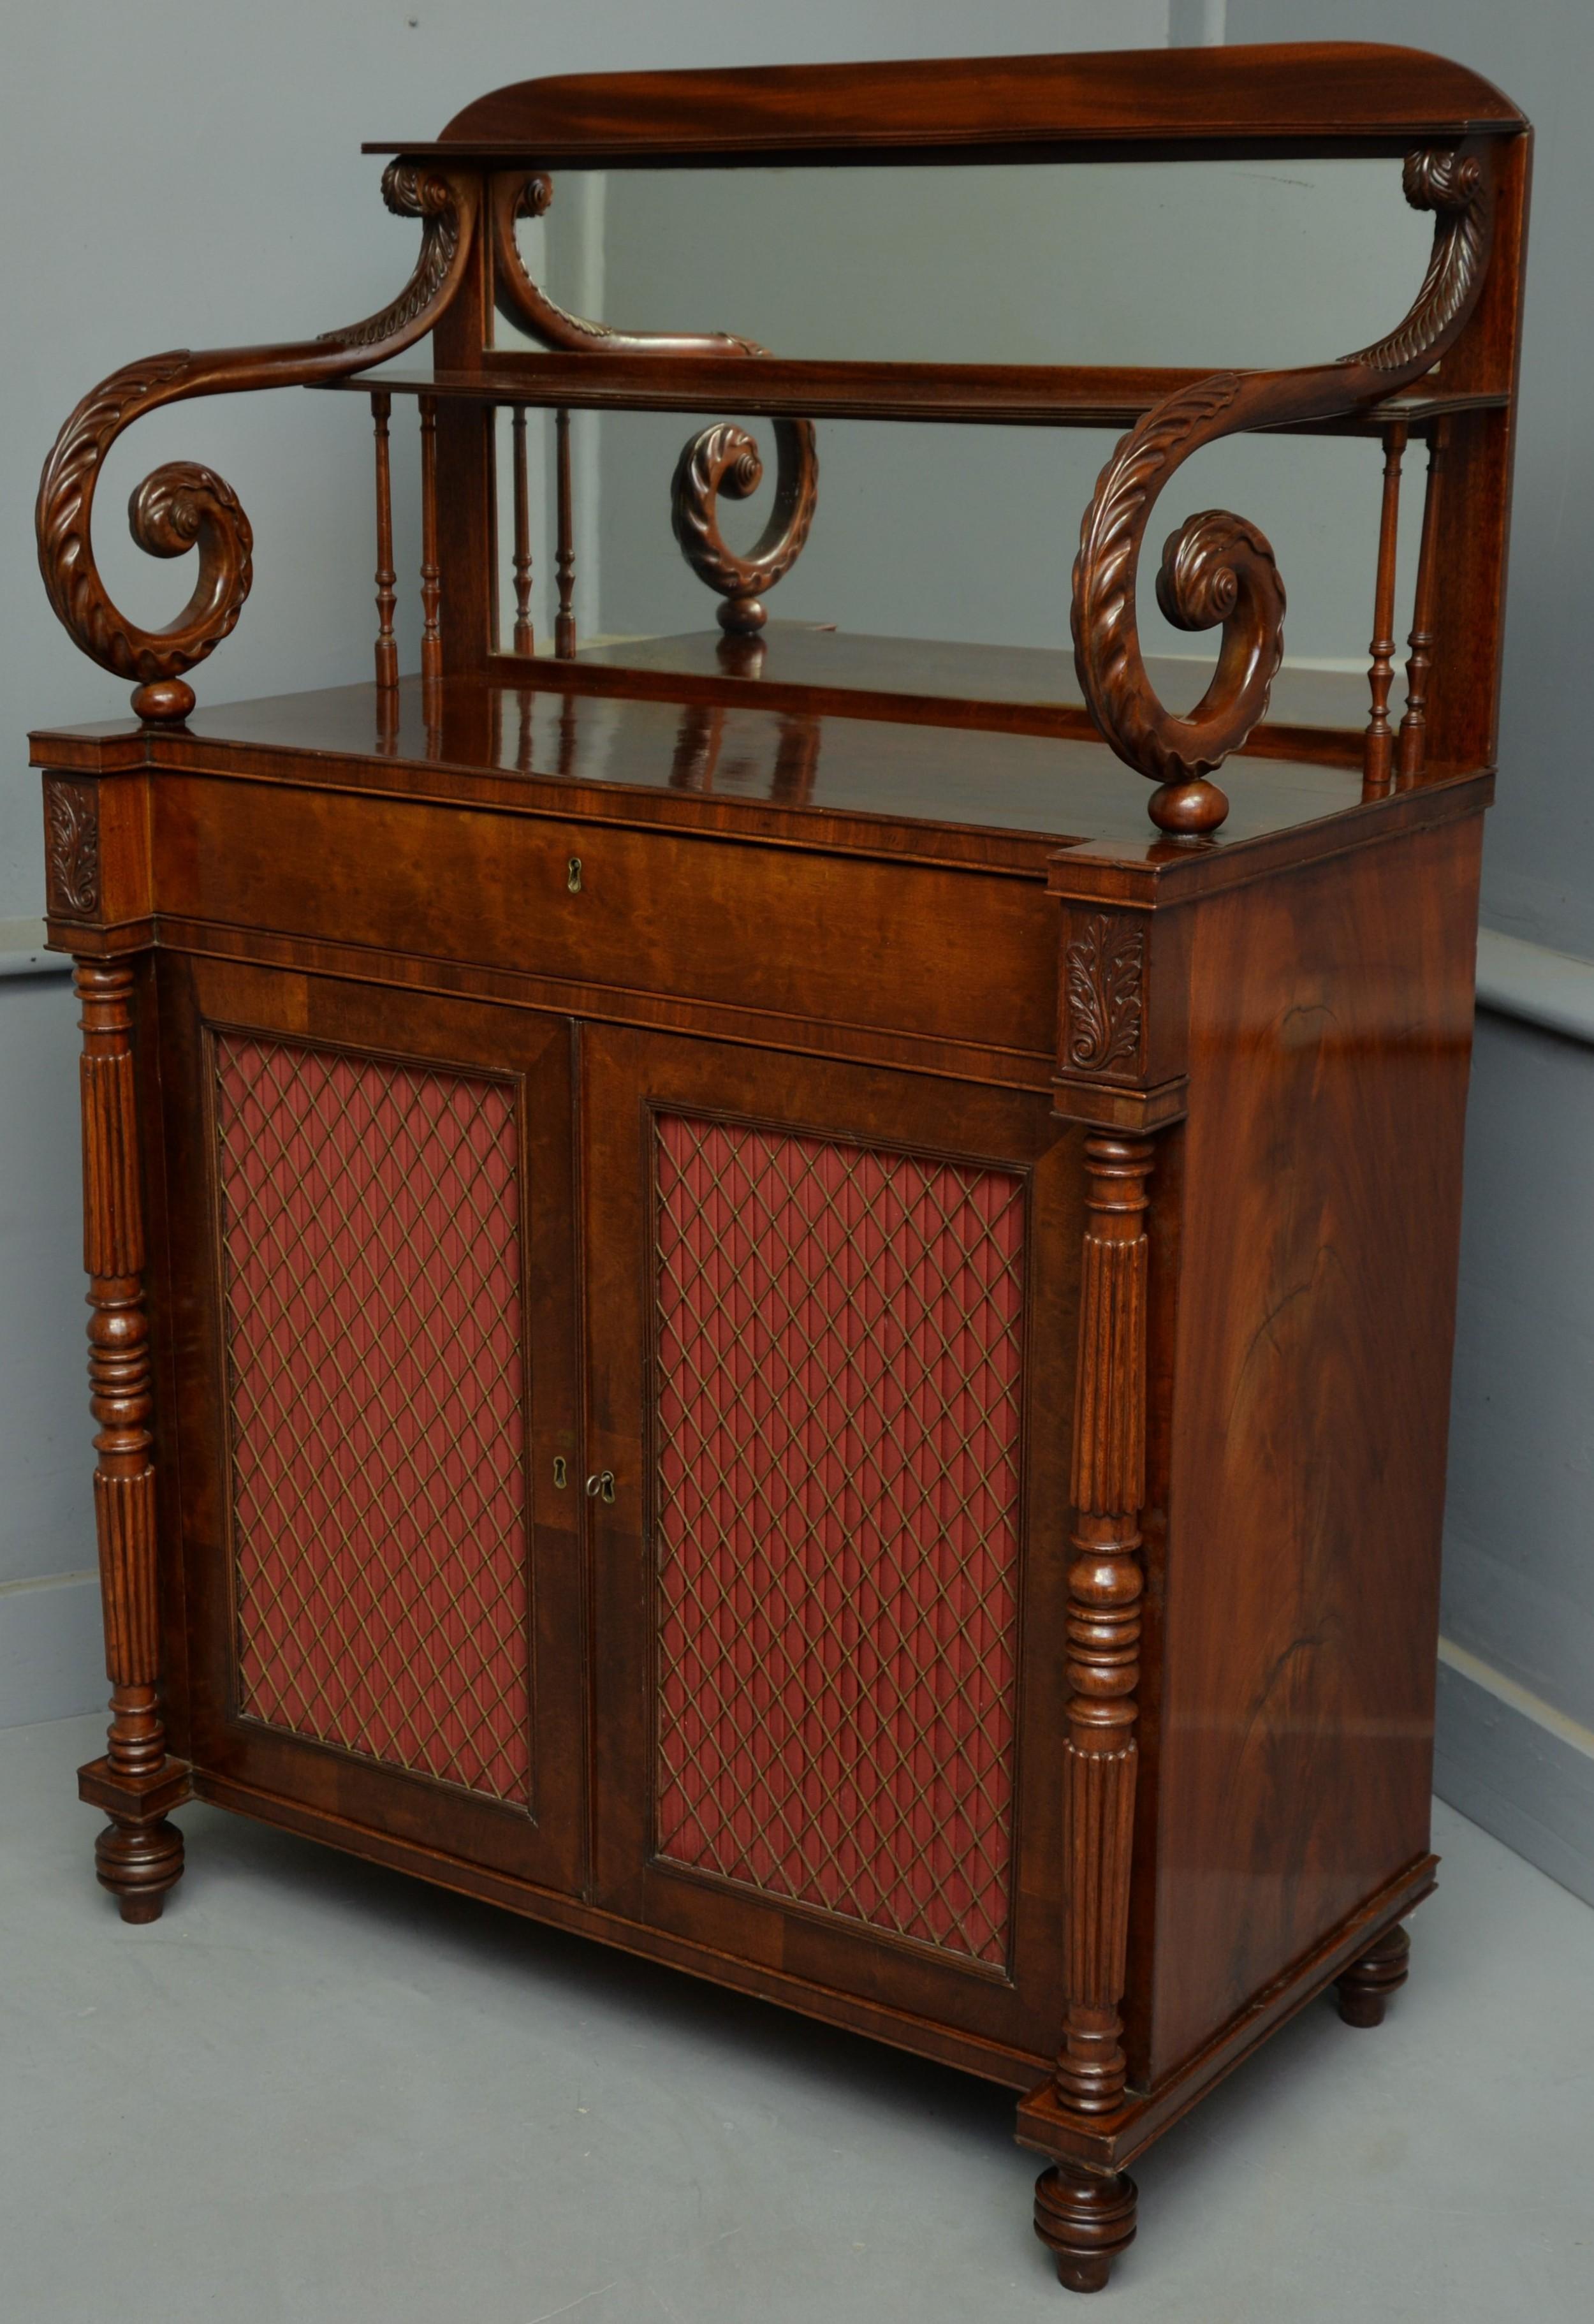 fine regency plumpudding mahogany chiffonier side cabinet